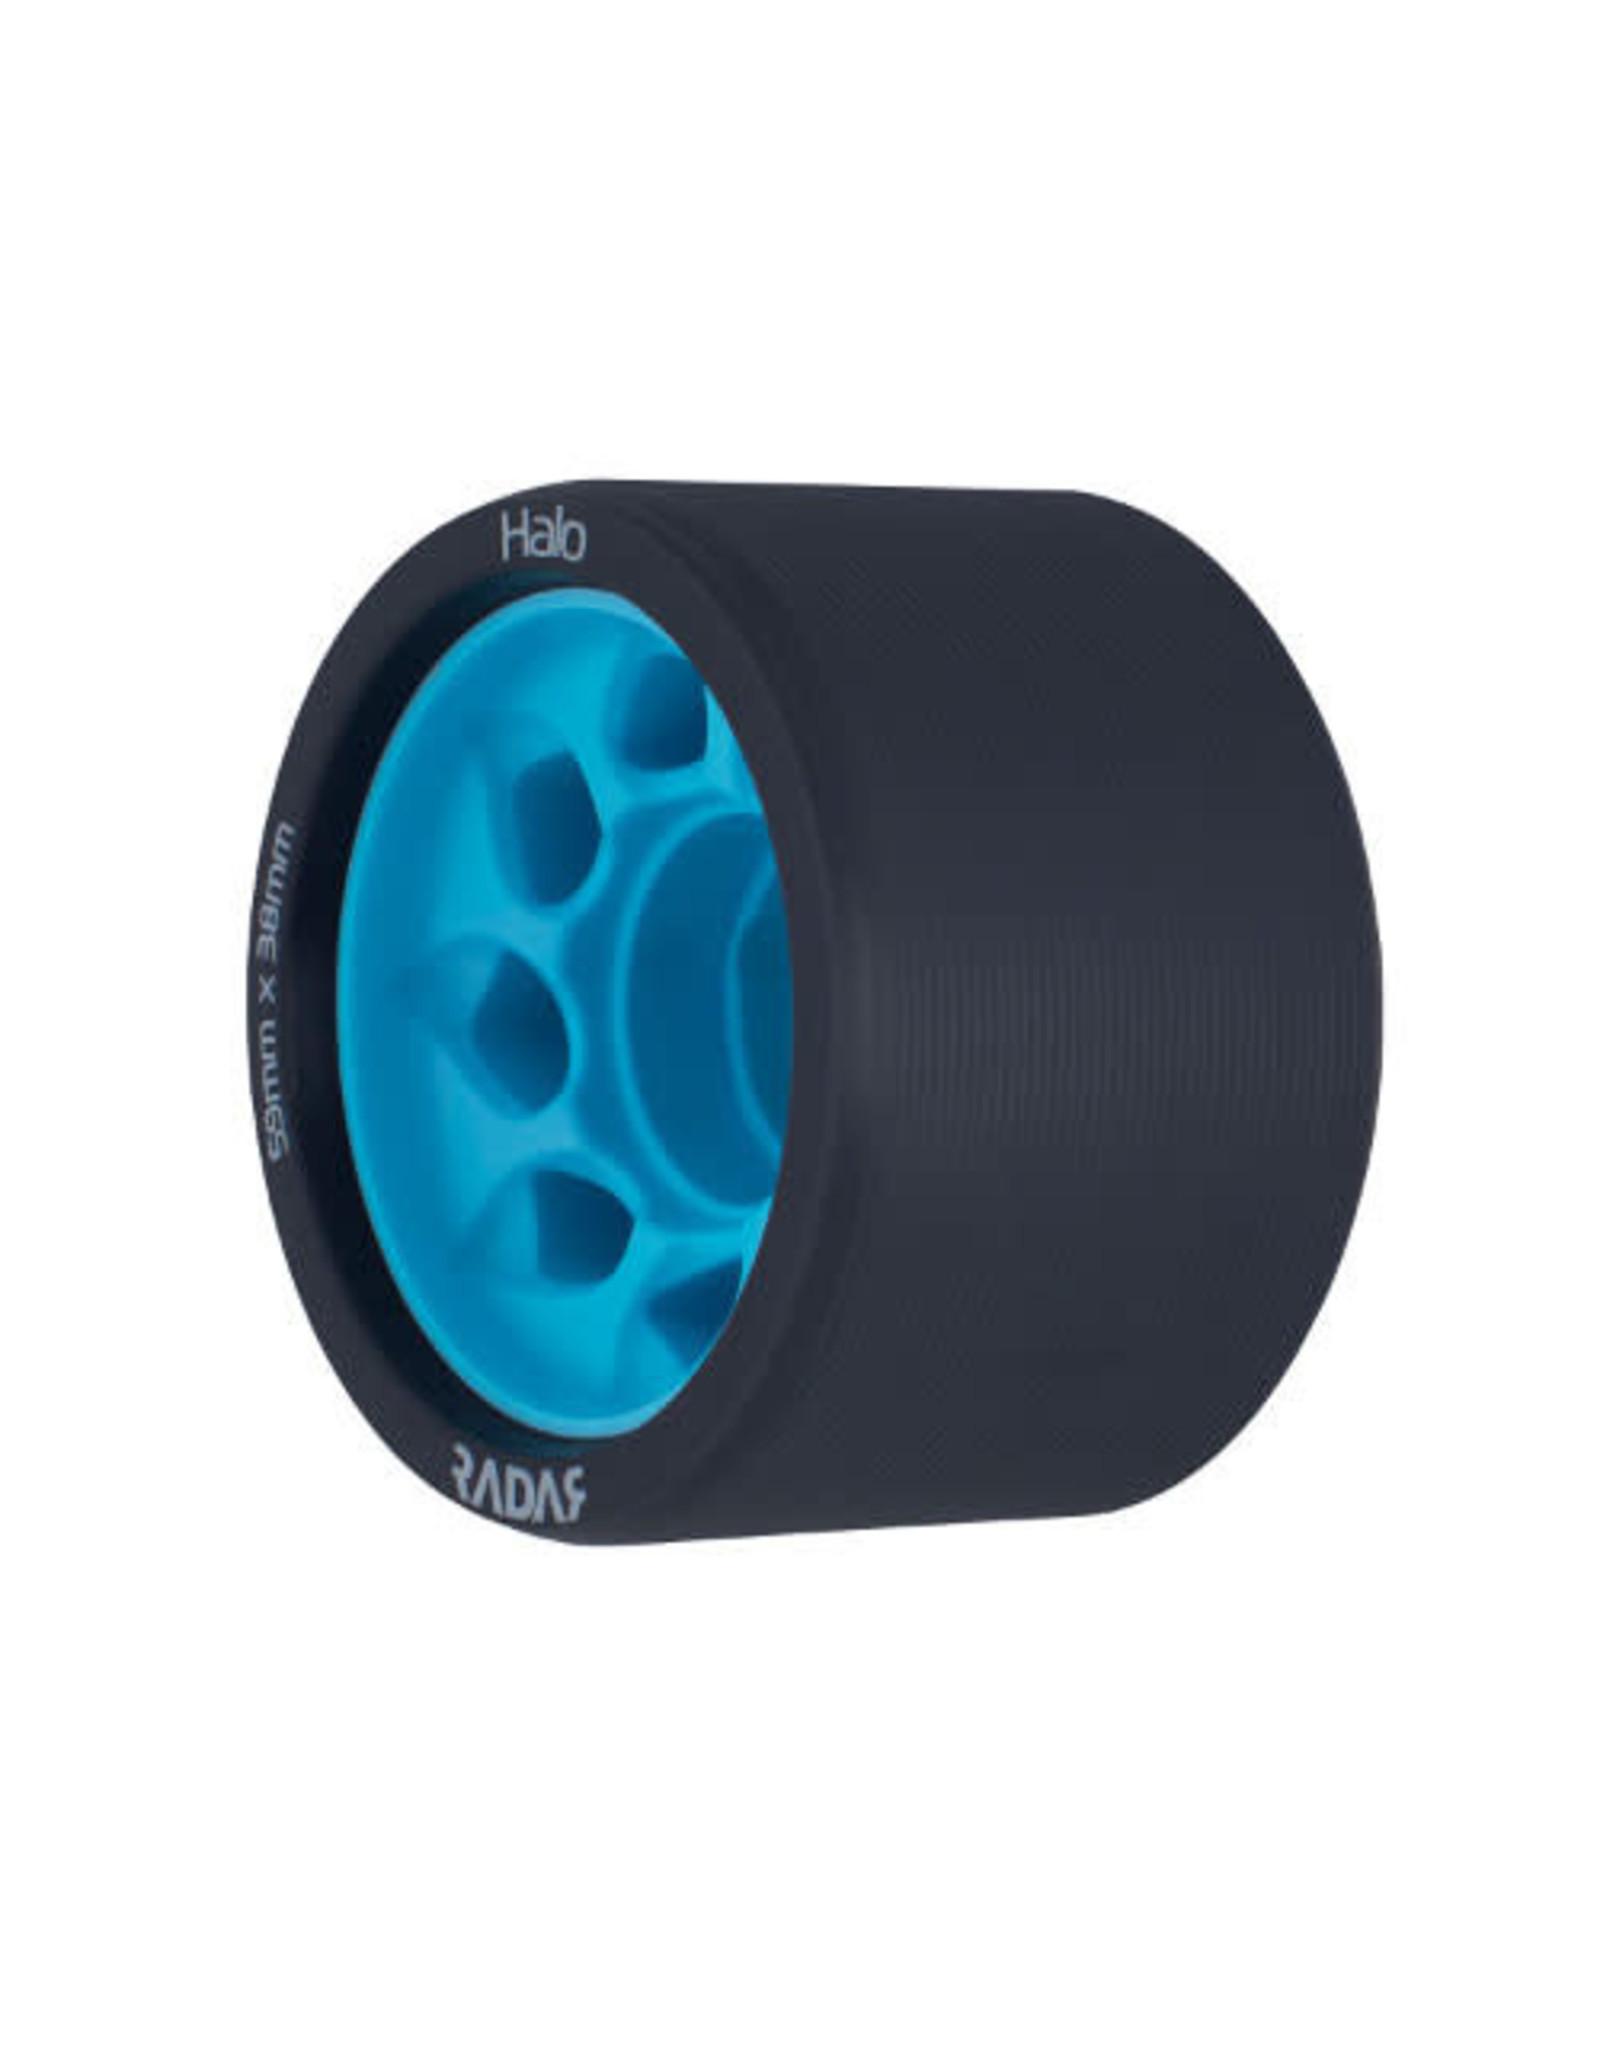 Radar Wheels Radar Halo